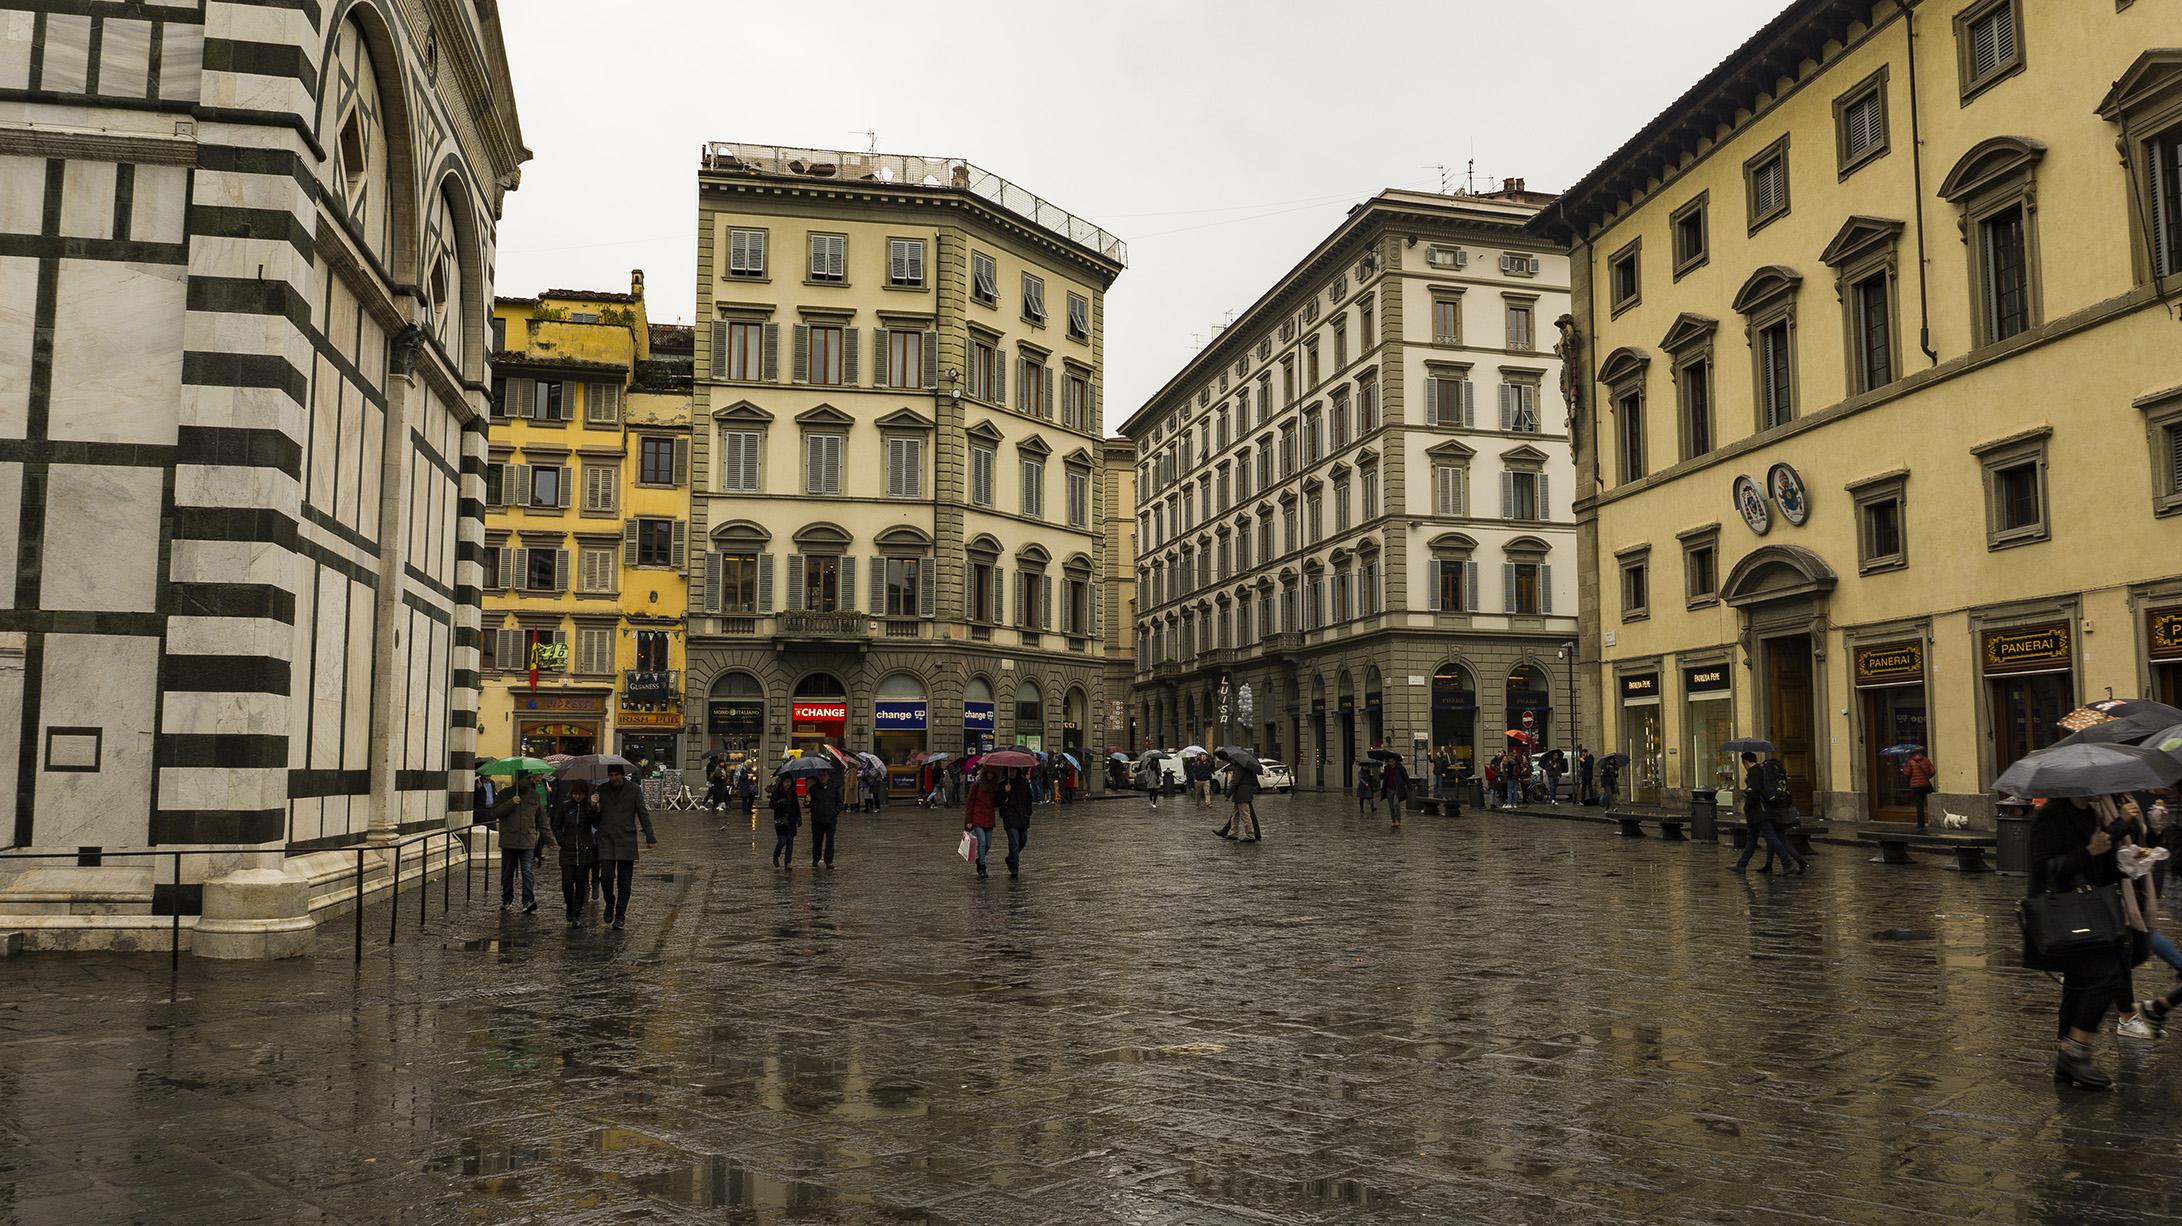 Достопримечательности Флоренции: Площадь Дуомо (Piazza del Duomo)